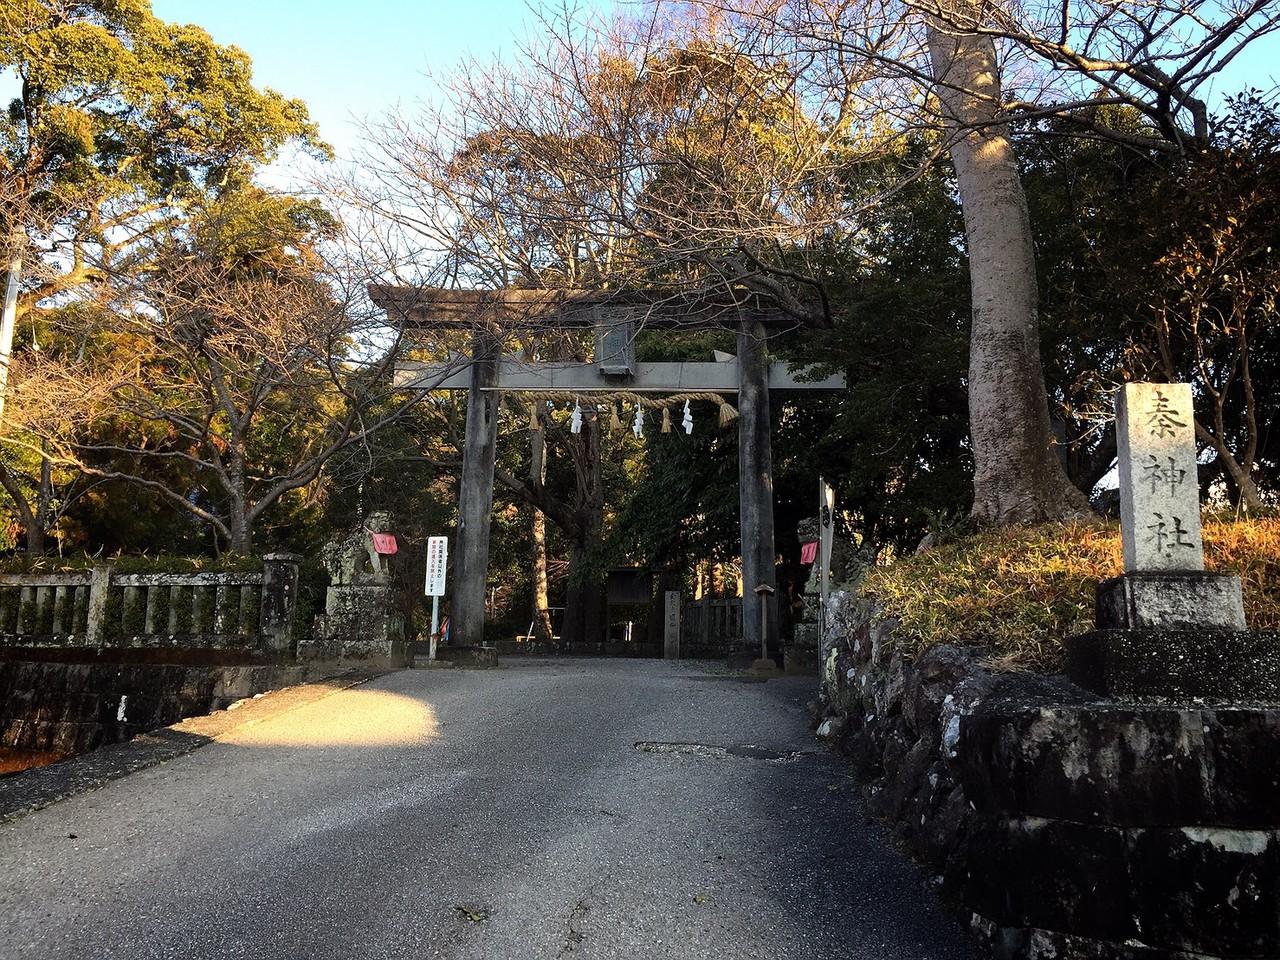 http://livedoor.blogimg.jp/umeka_0038/imgs/2/8/28b73dec.jpg